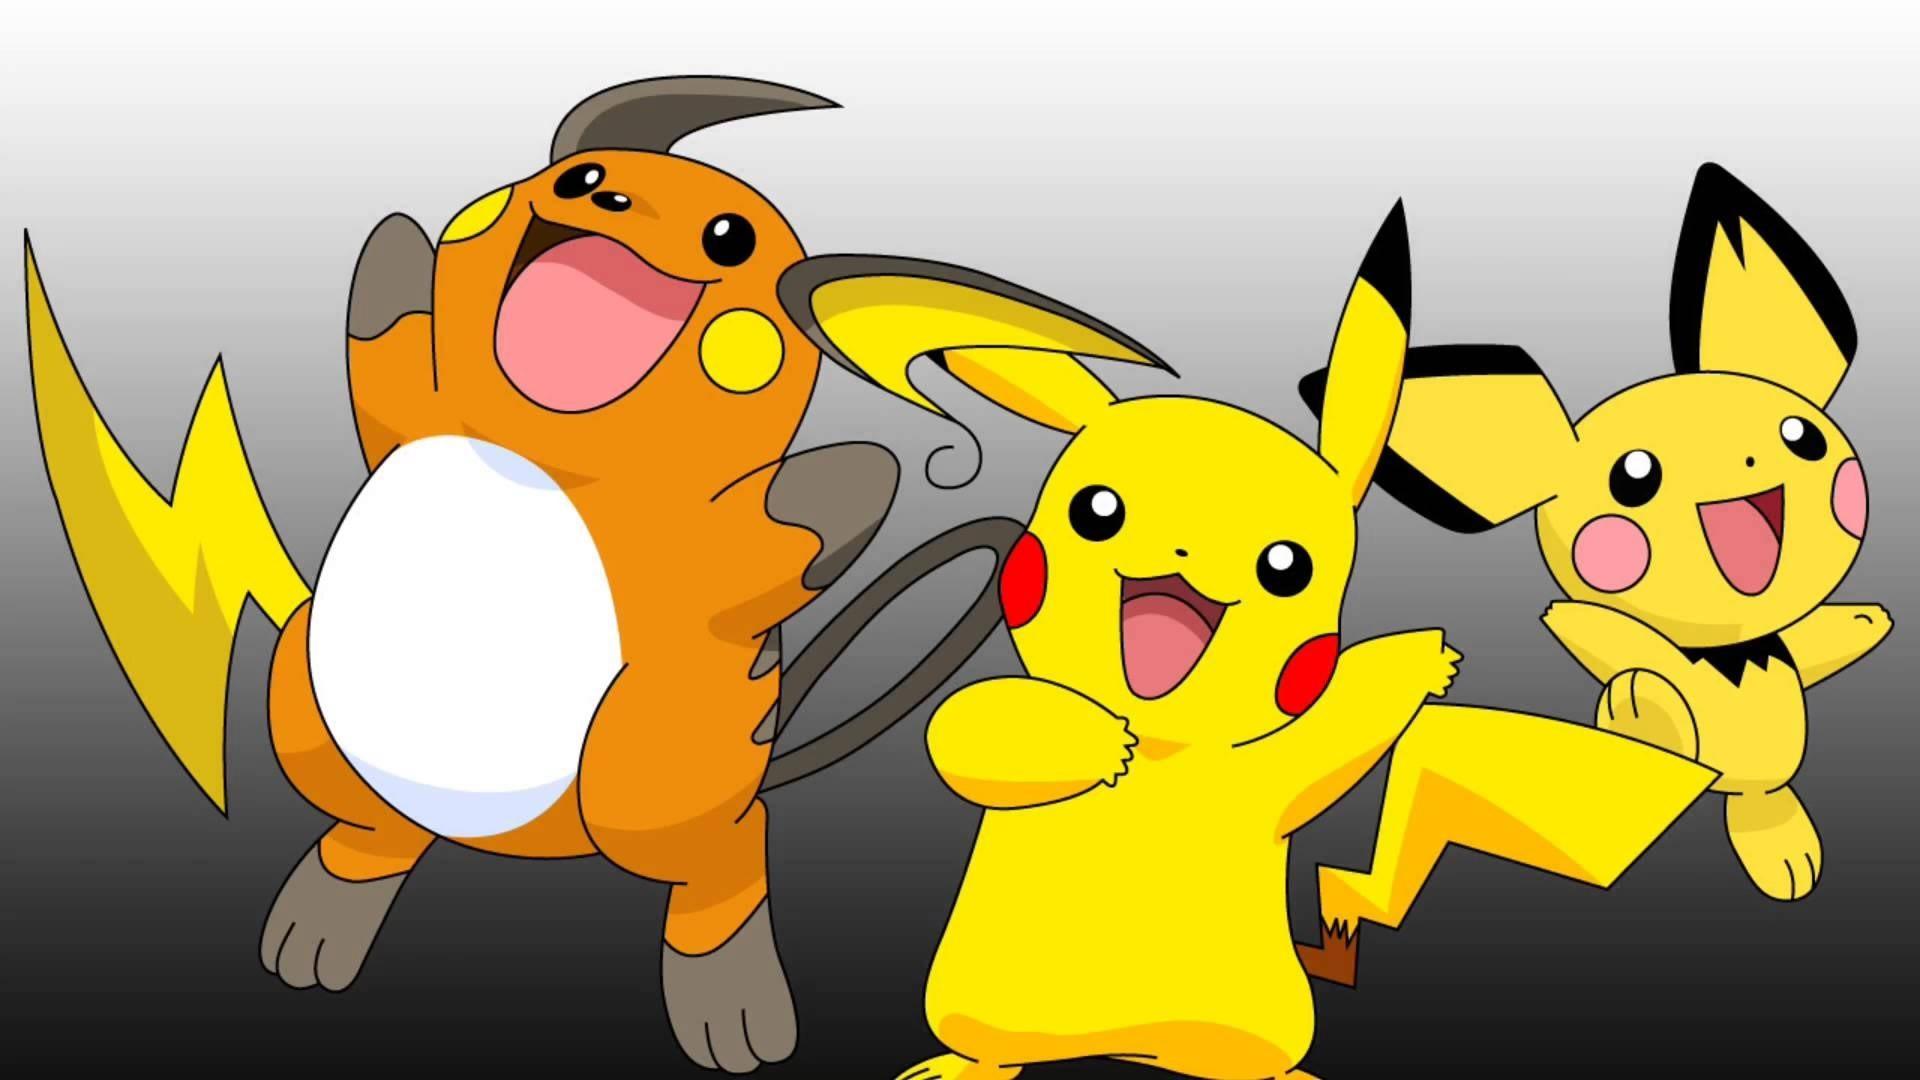 pikachu wallpaper images